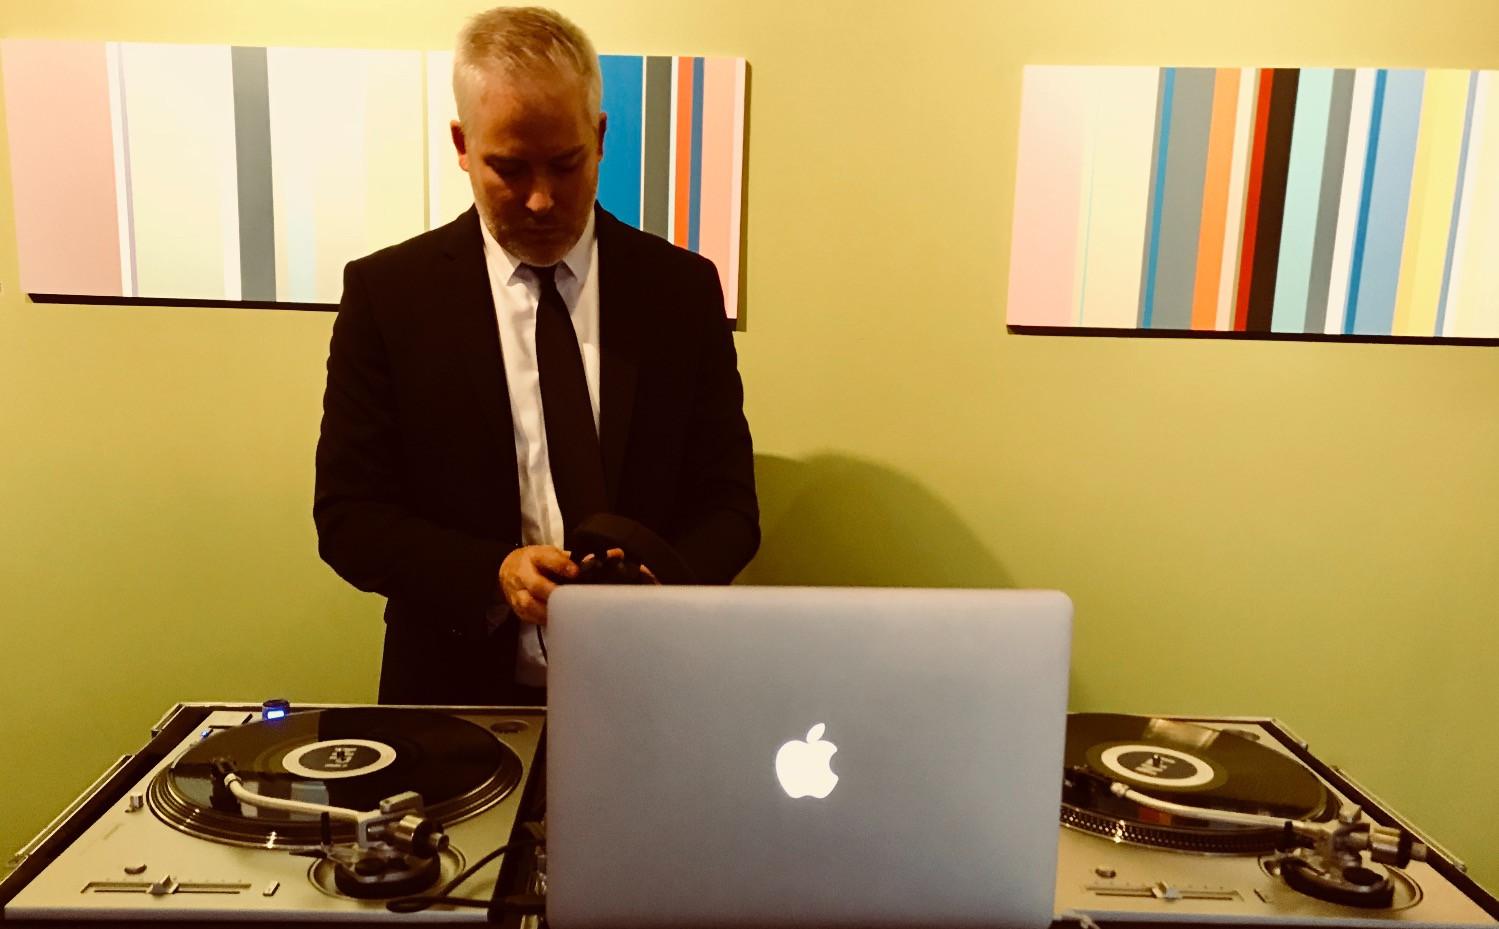 Brad Petty from NPi Entertainment